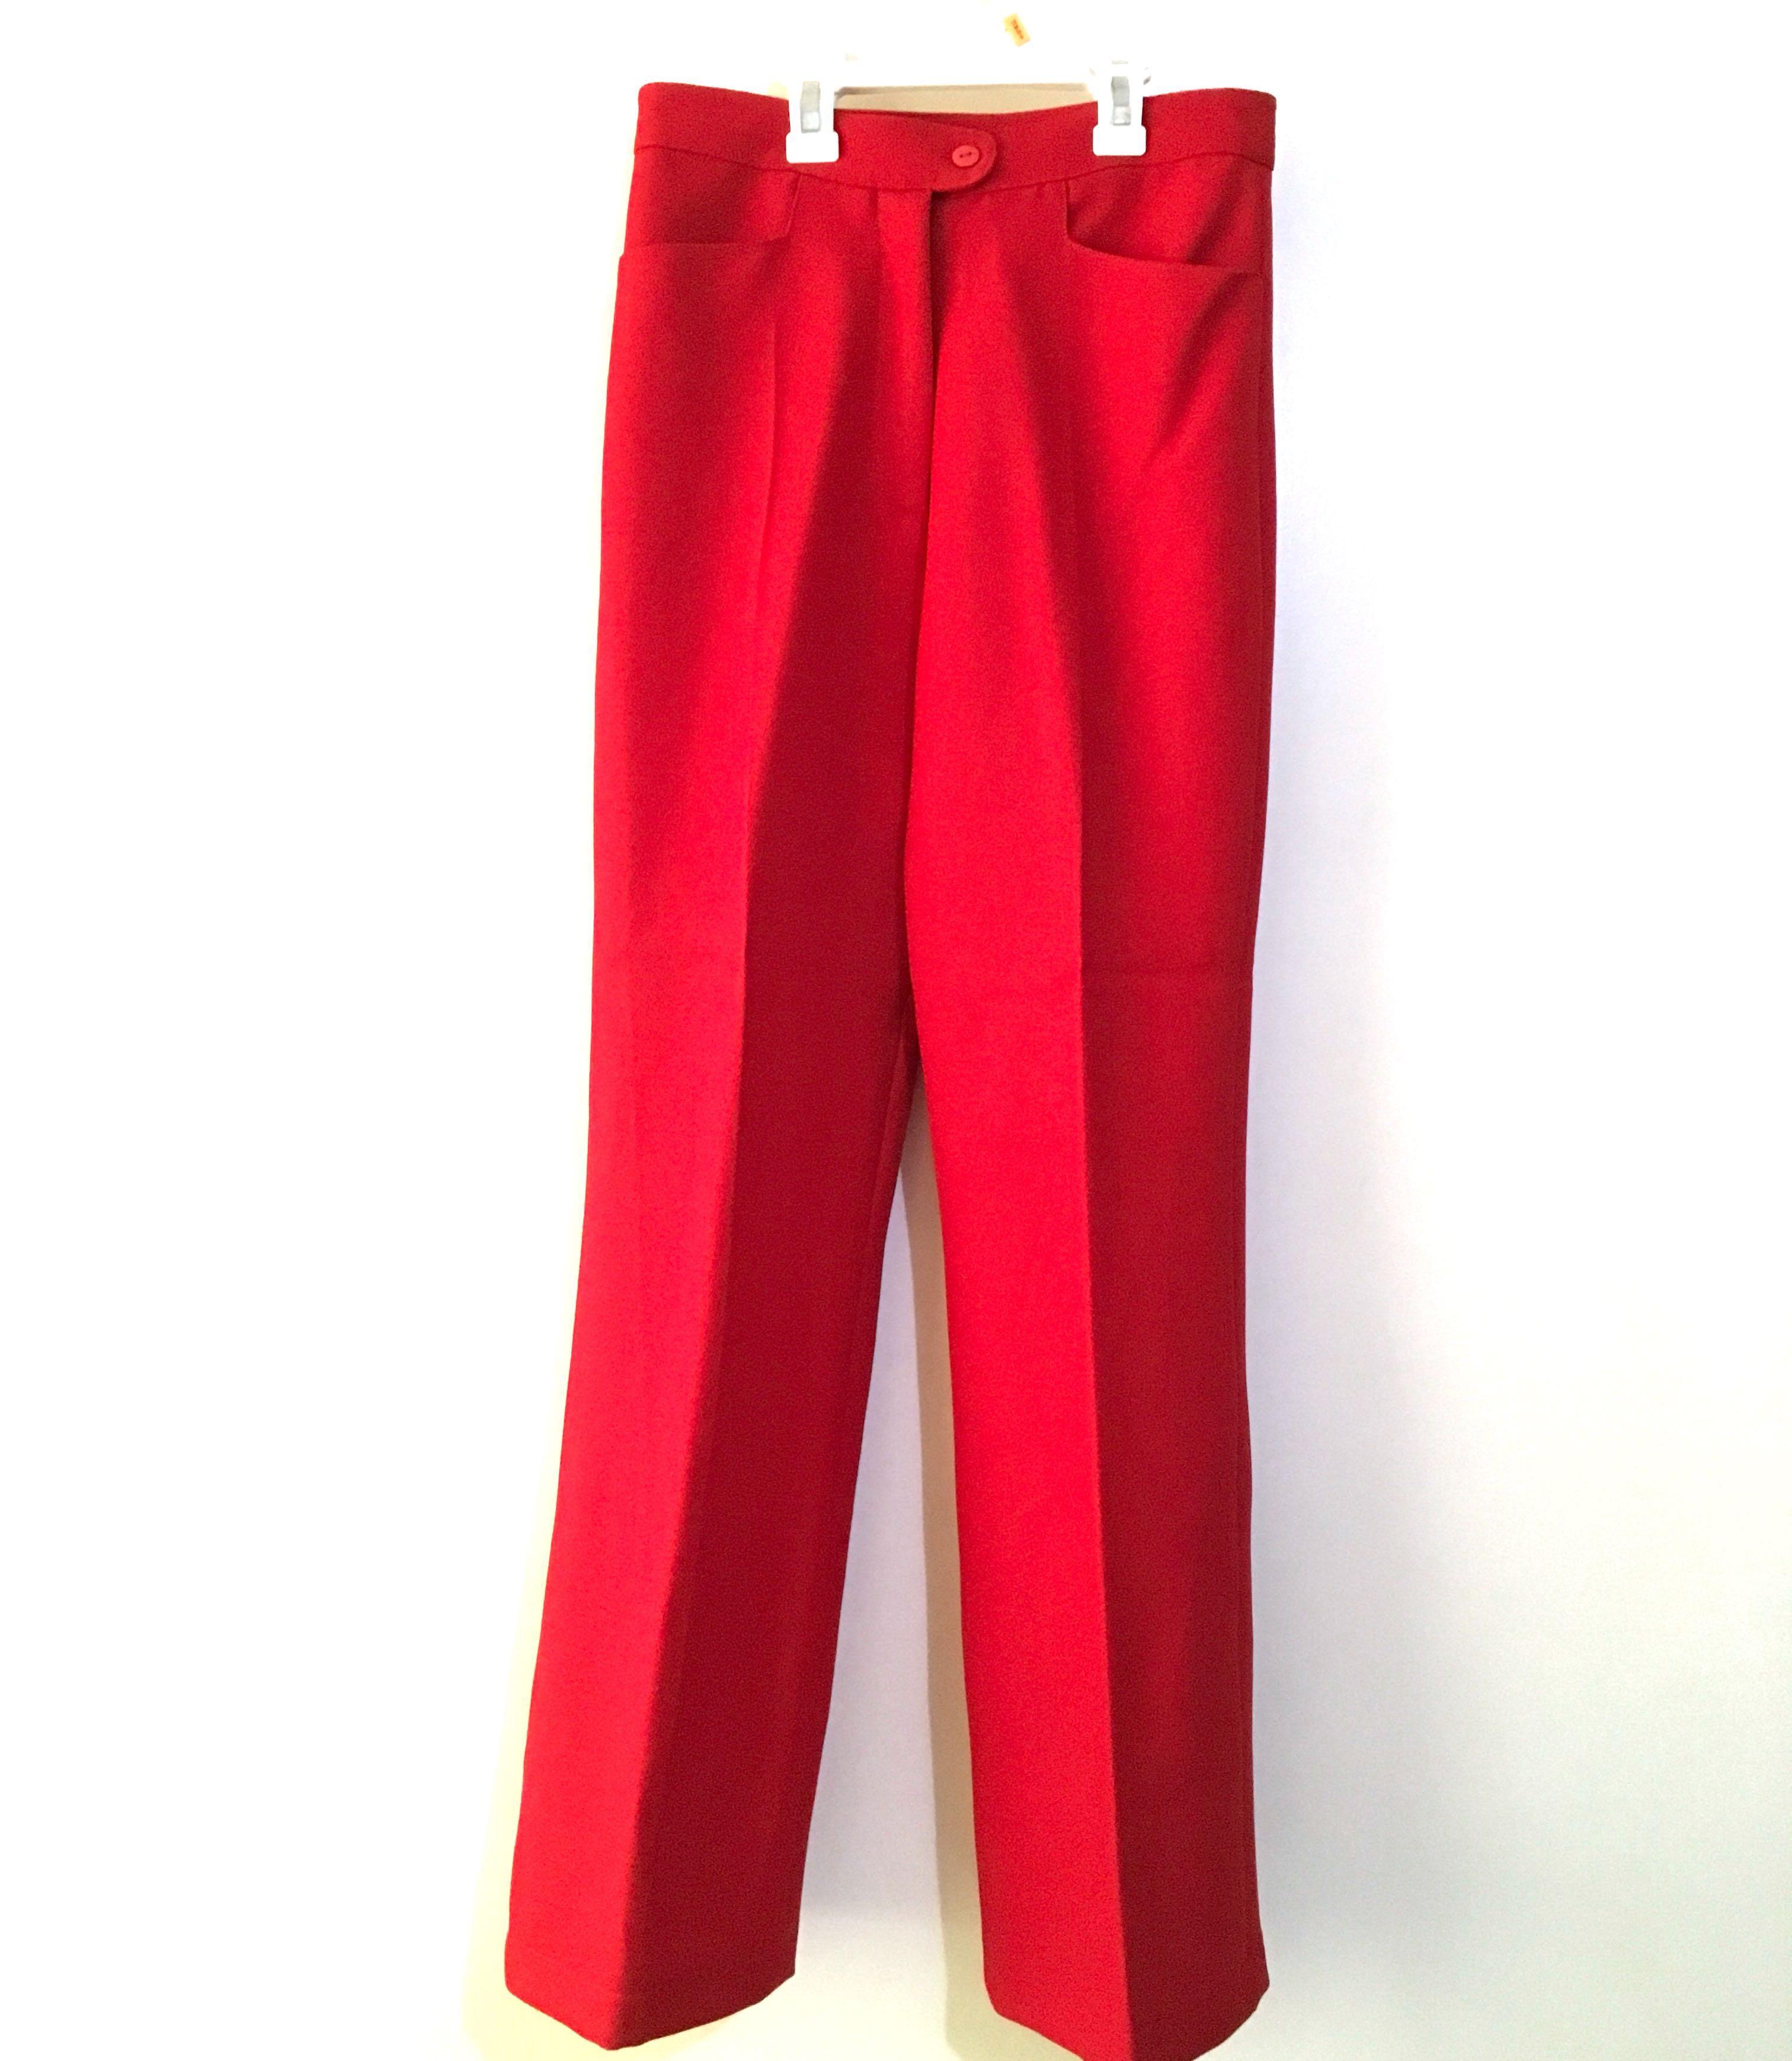 Charity Sale! Cherry Red 🍒 Women's Straight Leg Dress Pants Size Medium High Waisted Office Work Pants